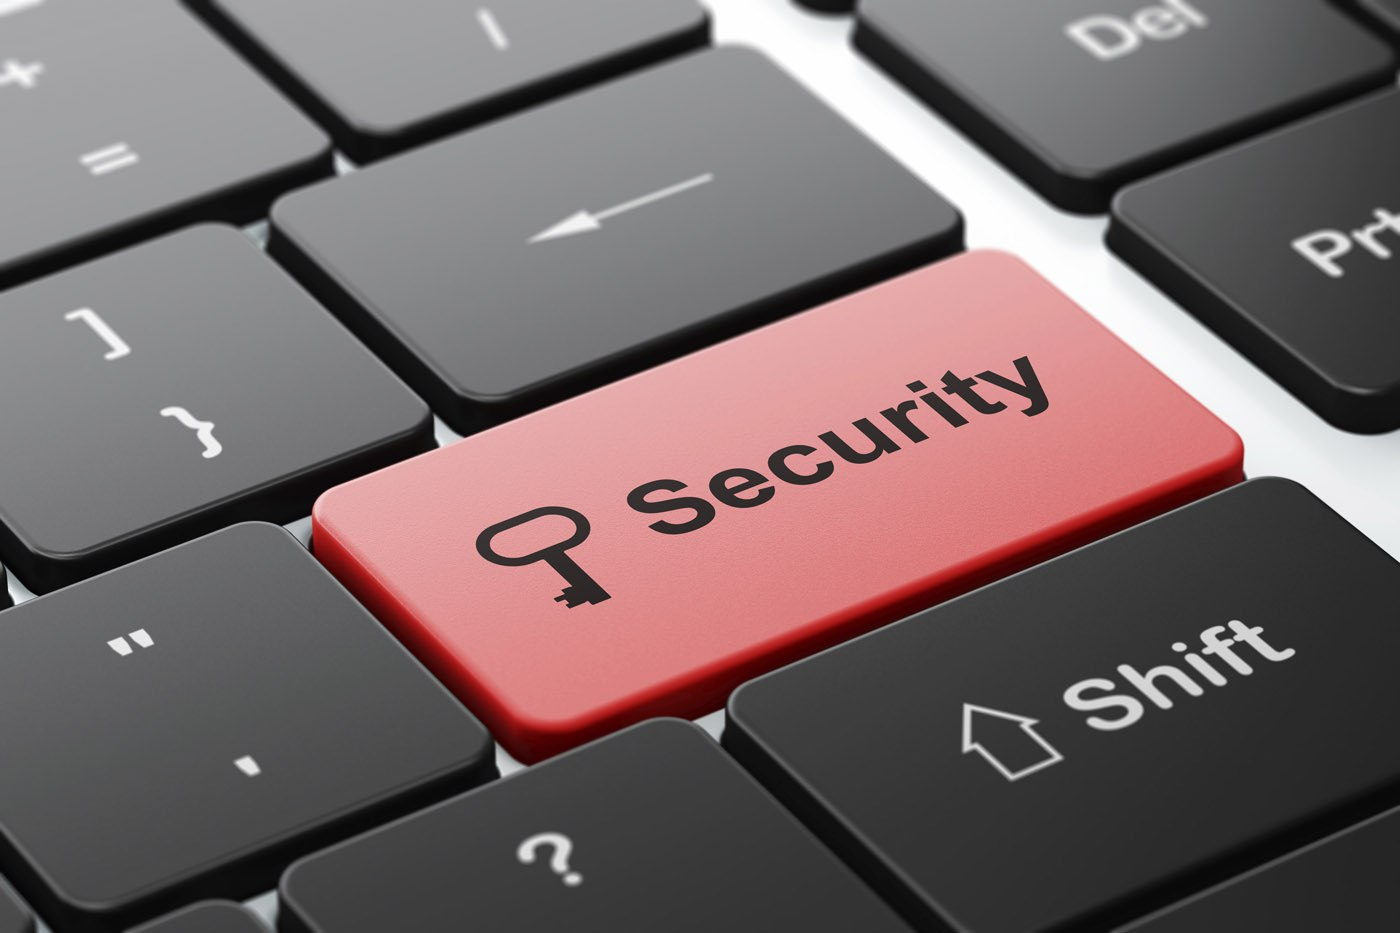 security_key.jpg